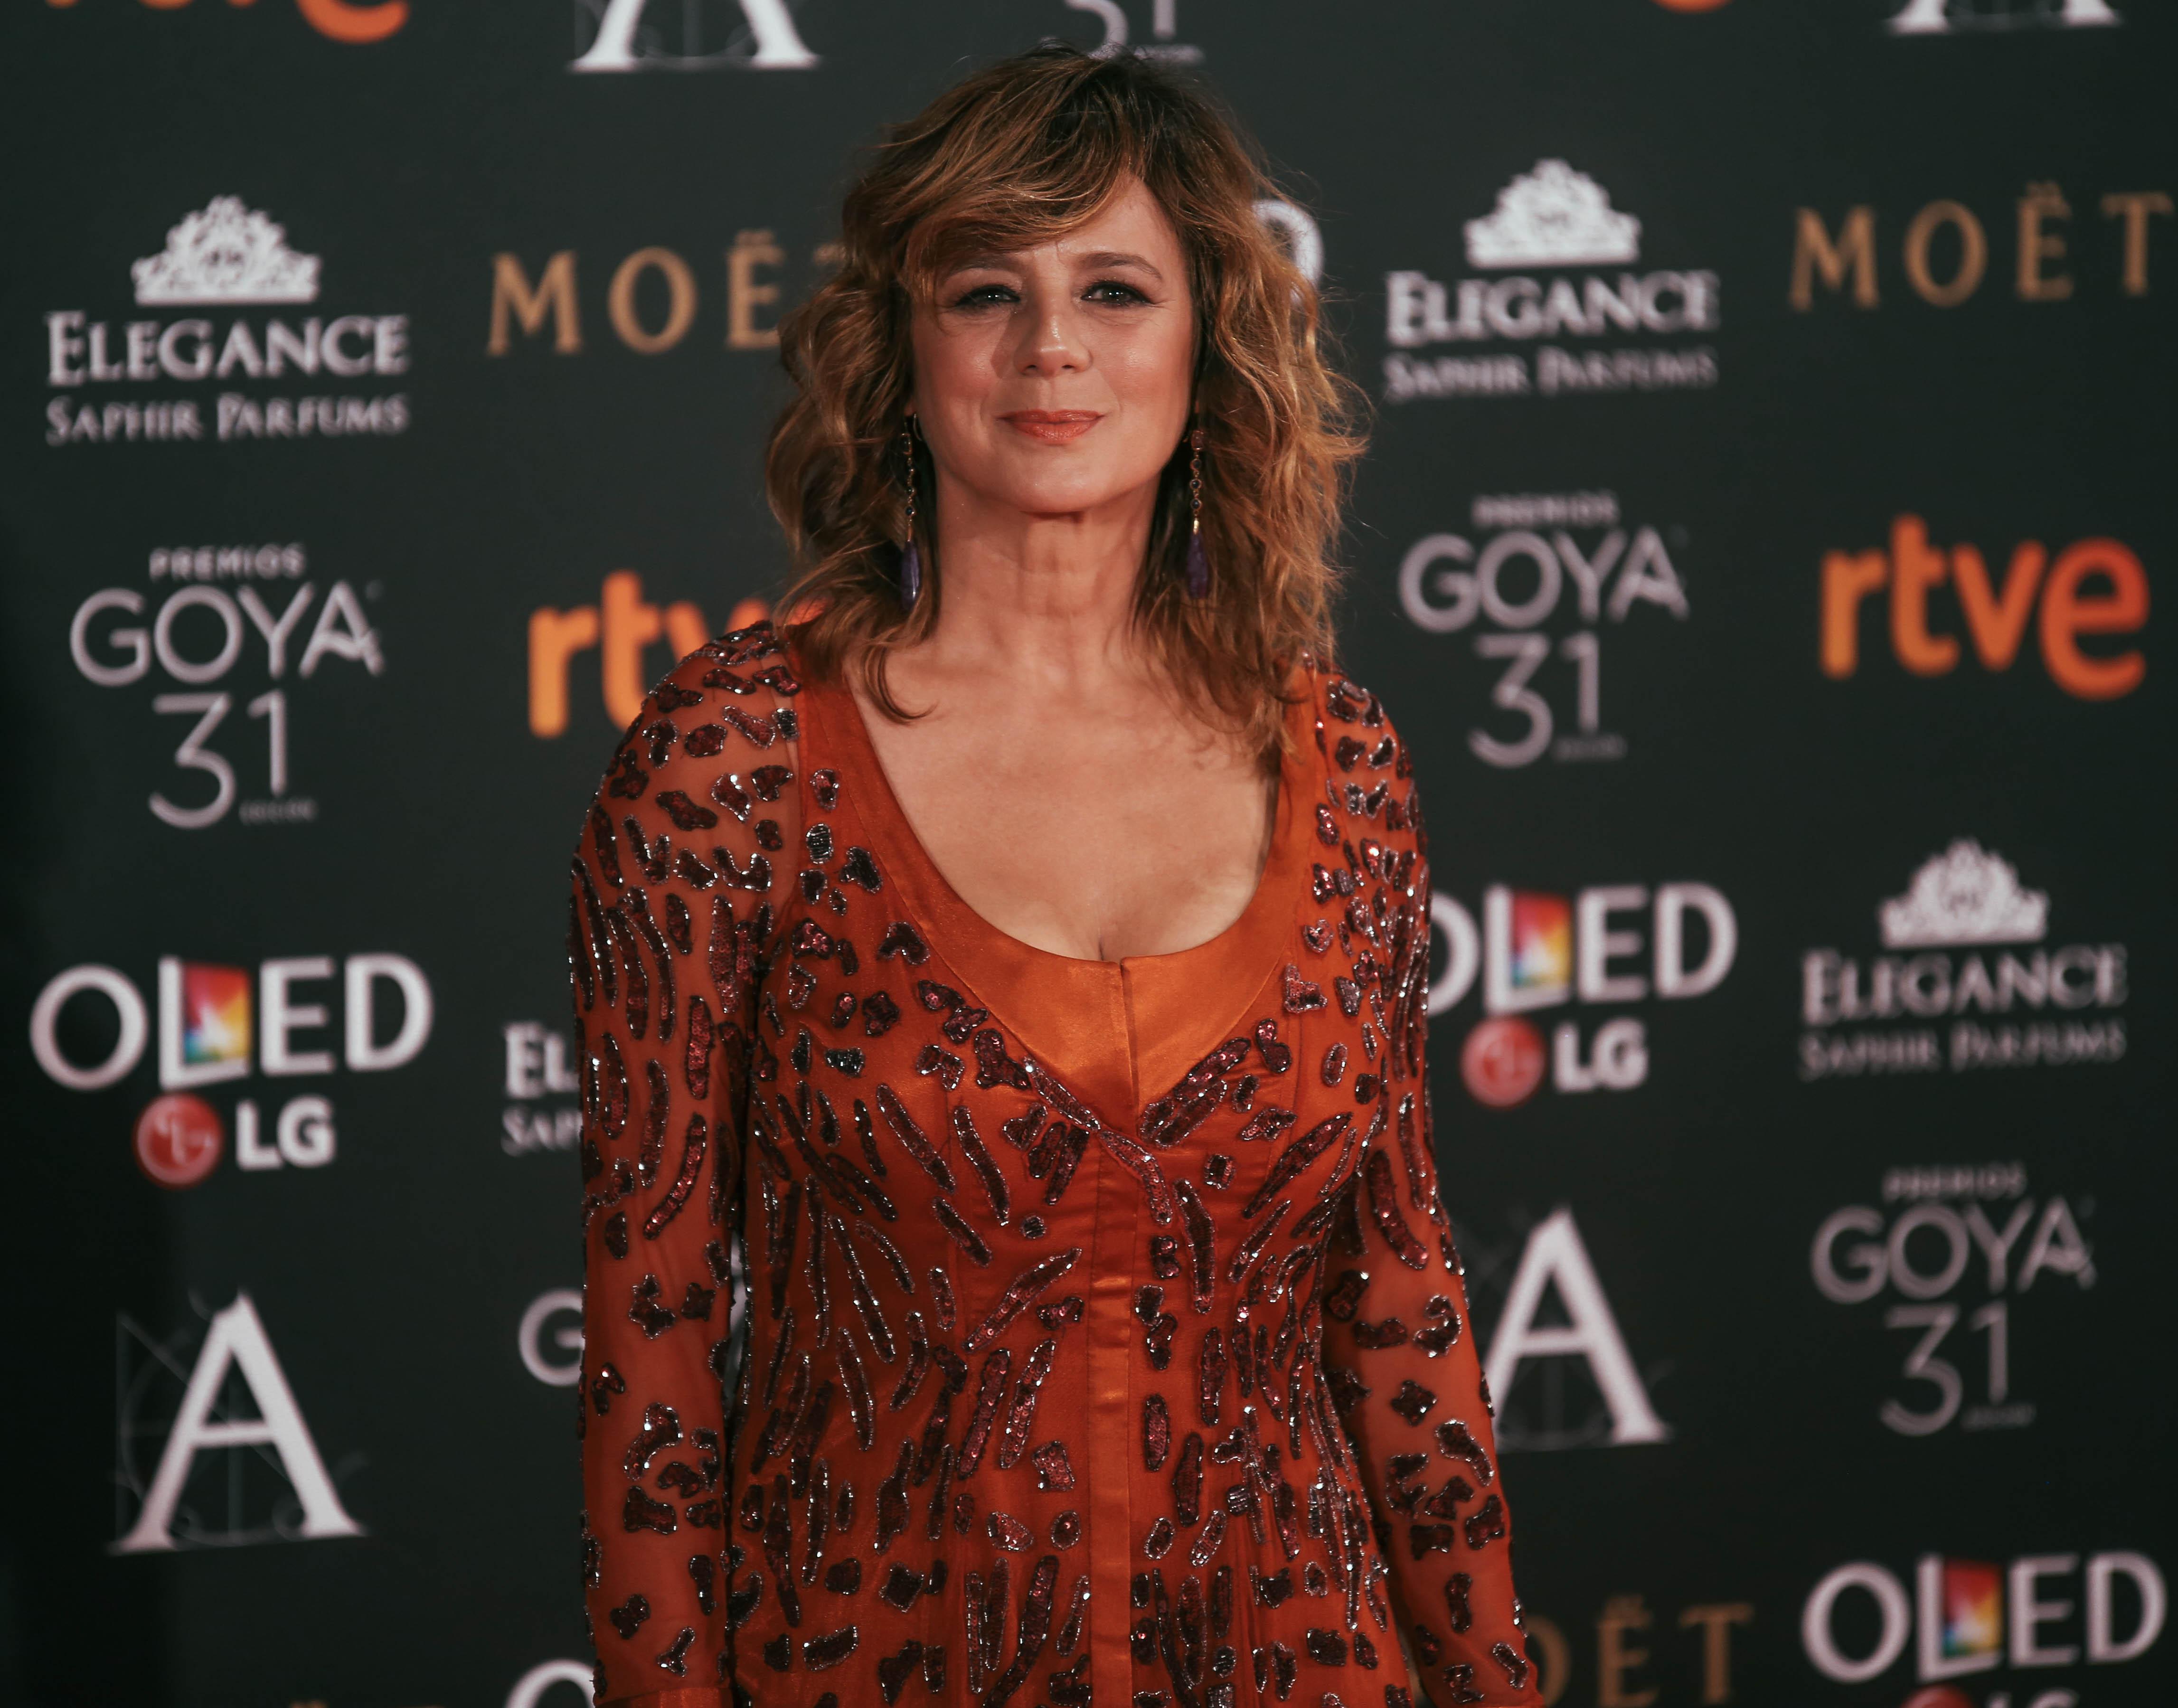 Ana Risueño Bajo La Piel emma suárez - wikipedia, la enciclopedia libre